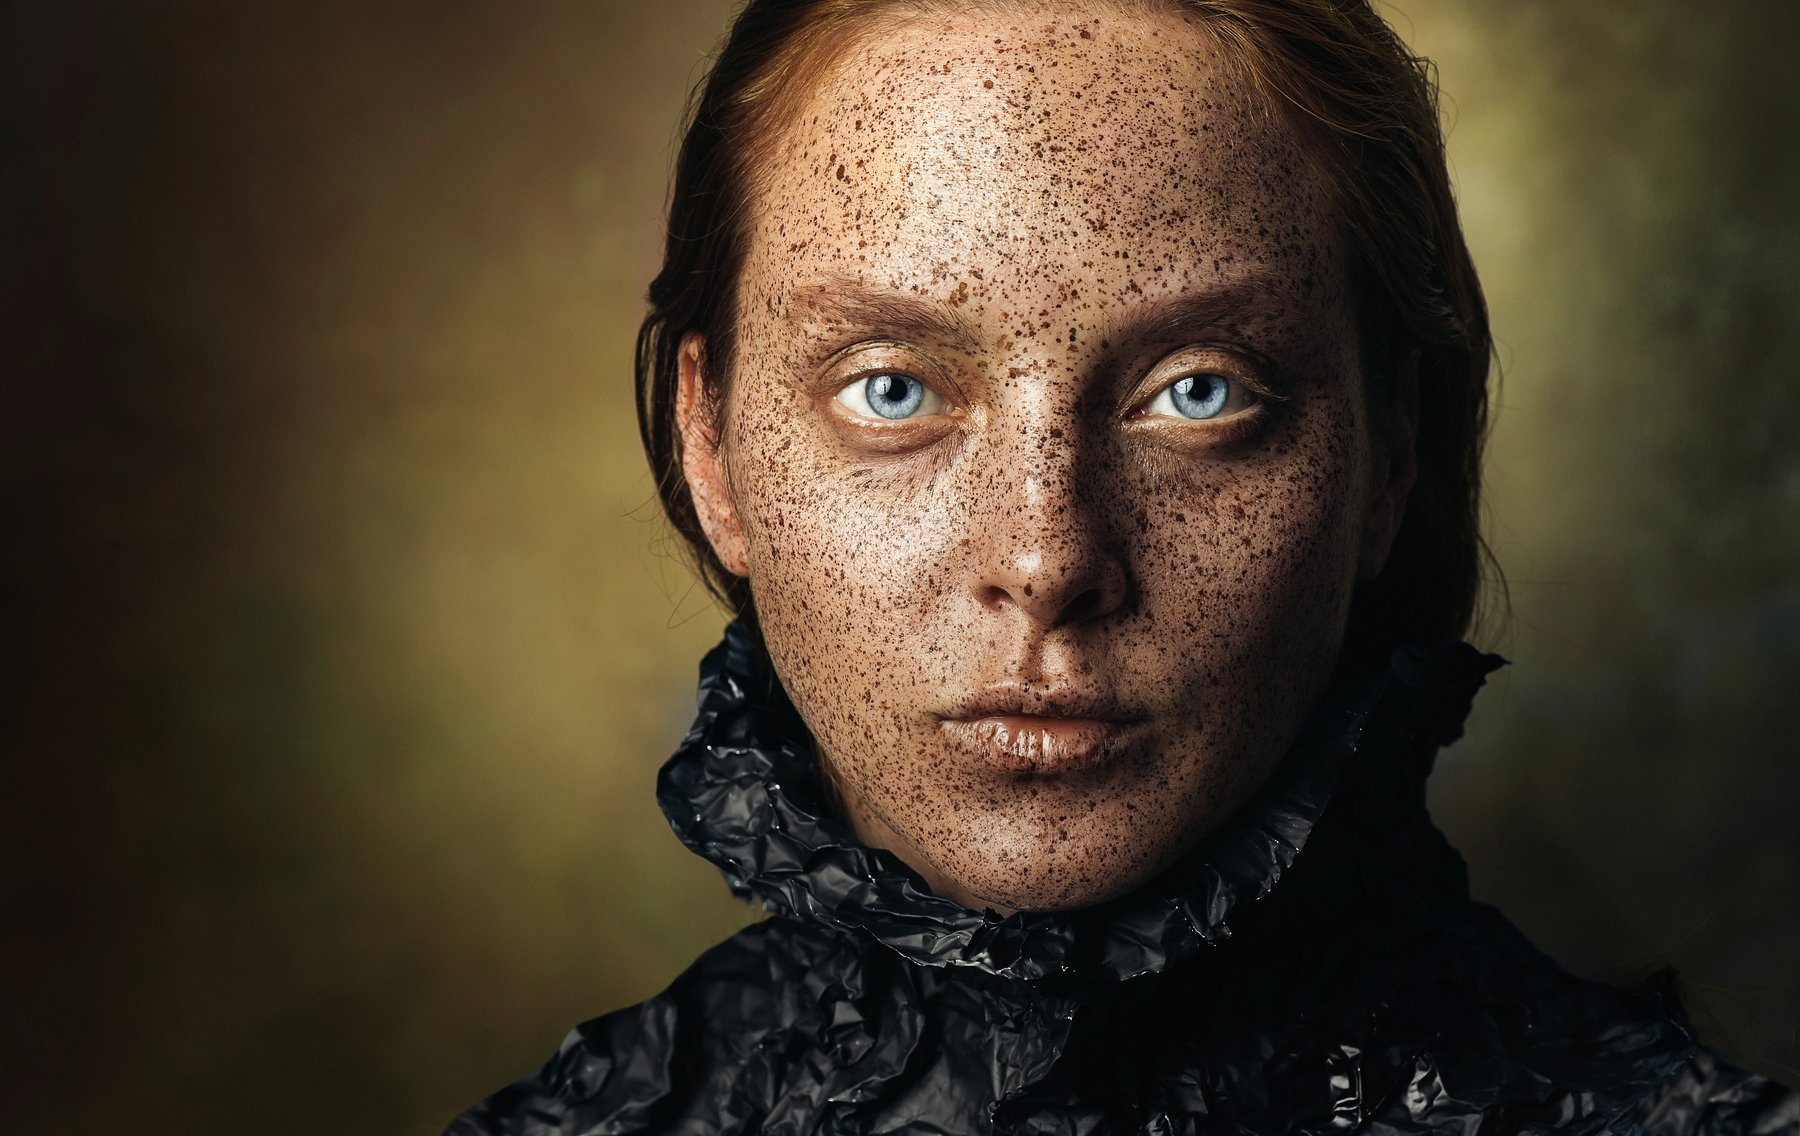 girl, portrait, color, woman, emotions, eyes, face, photo, moscow, people, light, Андрей Лободин